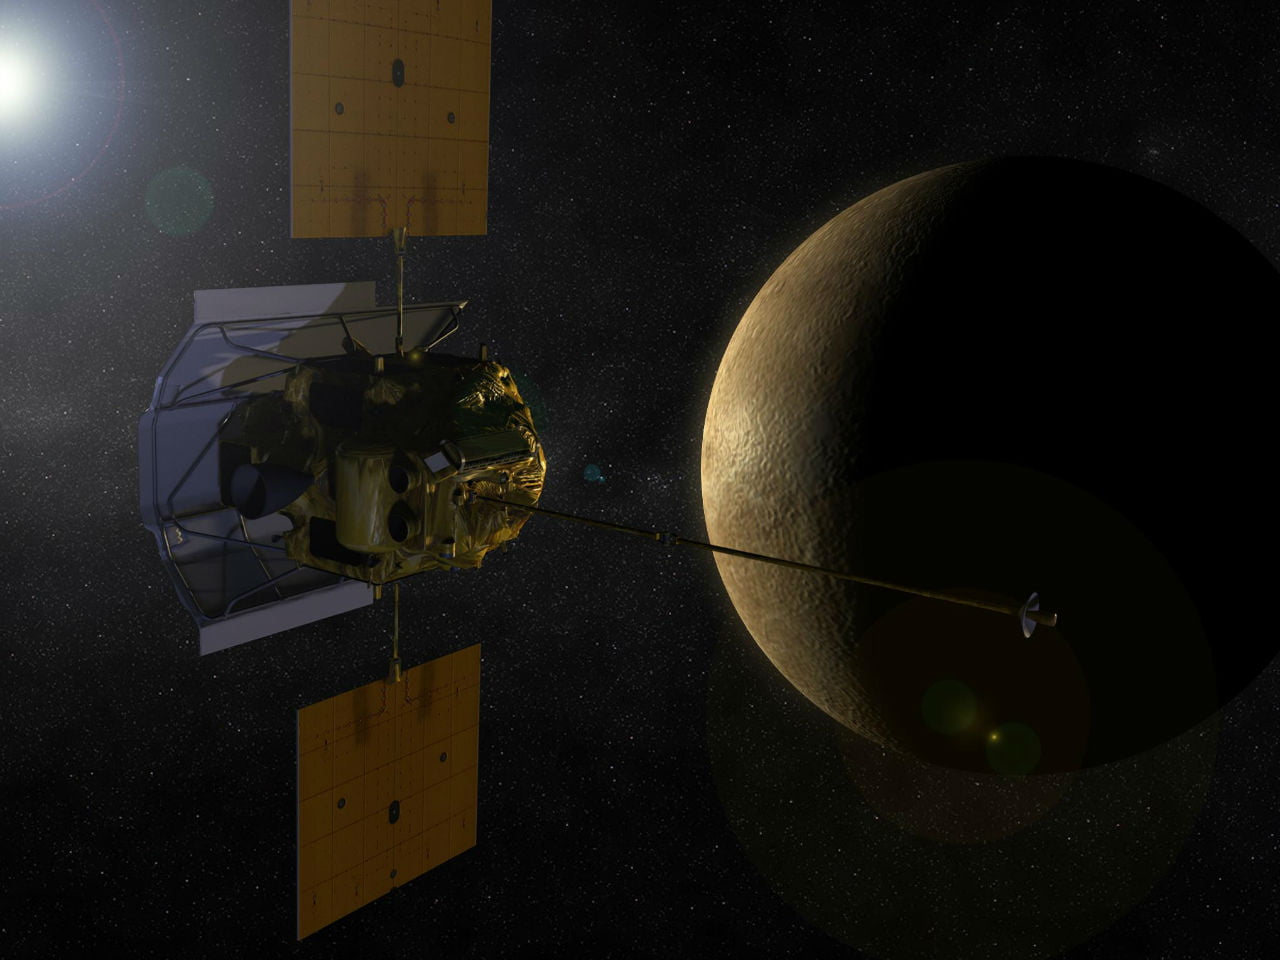 nasa-messenger-probe-mercury-approach